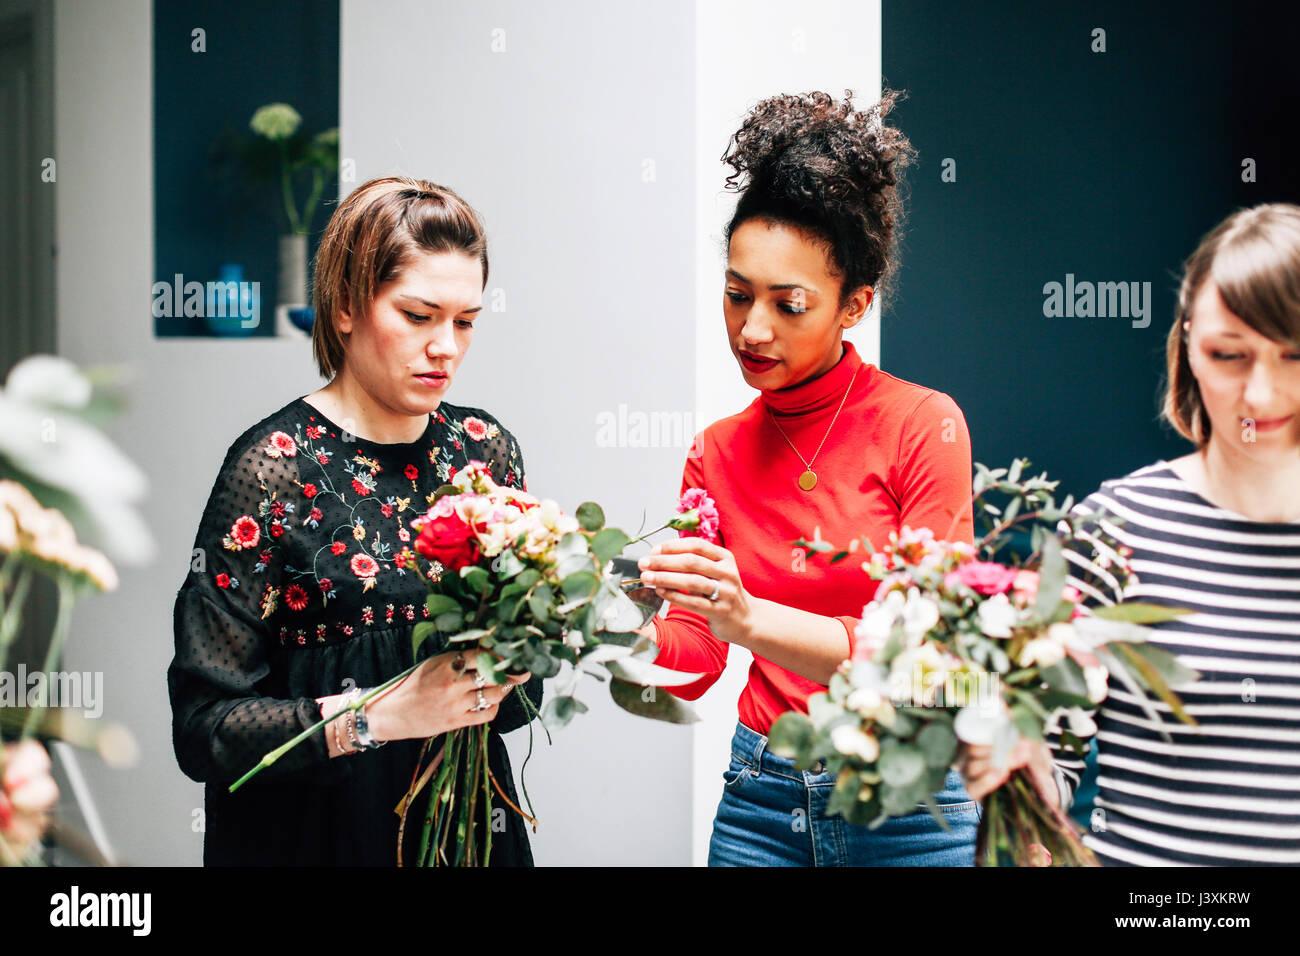 Florist students arranging bouquets at flower arranging workshop - Stock Image